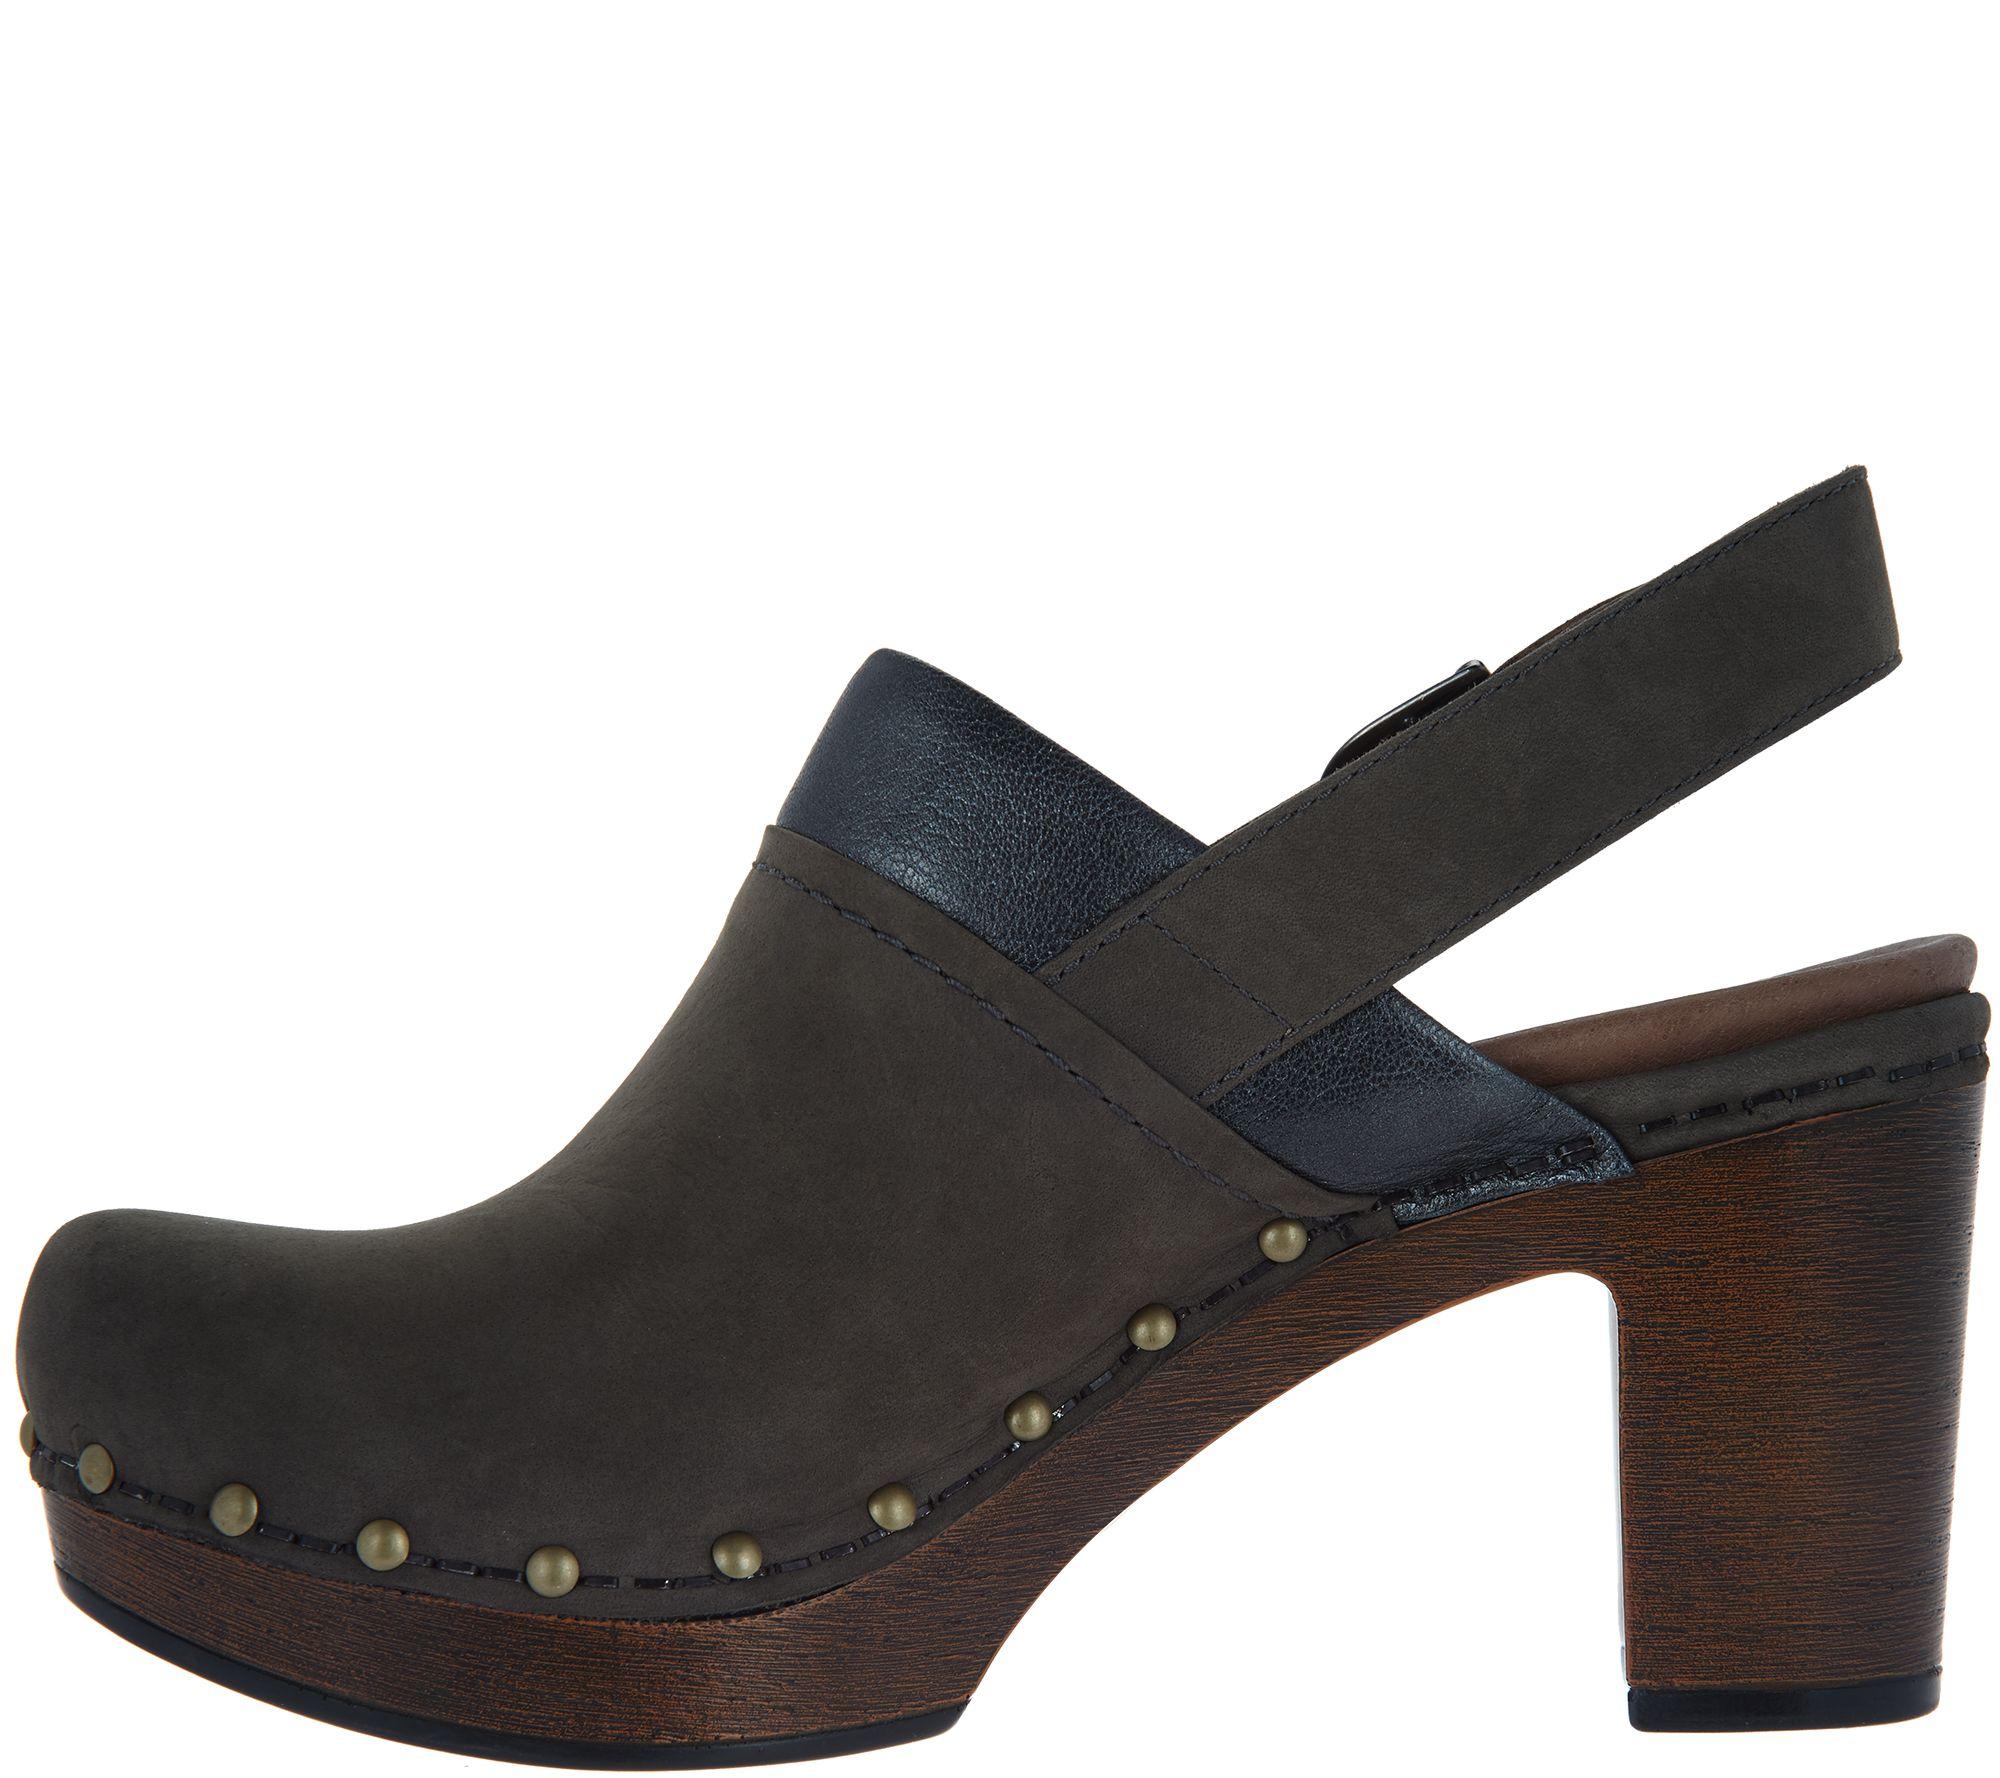 853e698636bb Dansko Nubuck Leather Block Heel Clogs - Delle - Page 1 — QVC.com